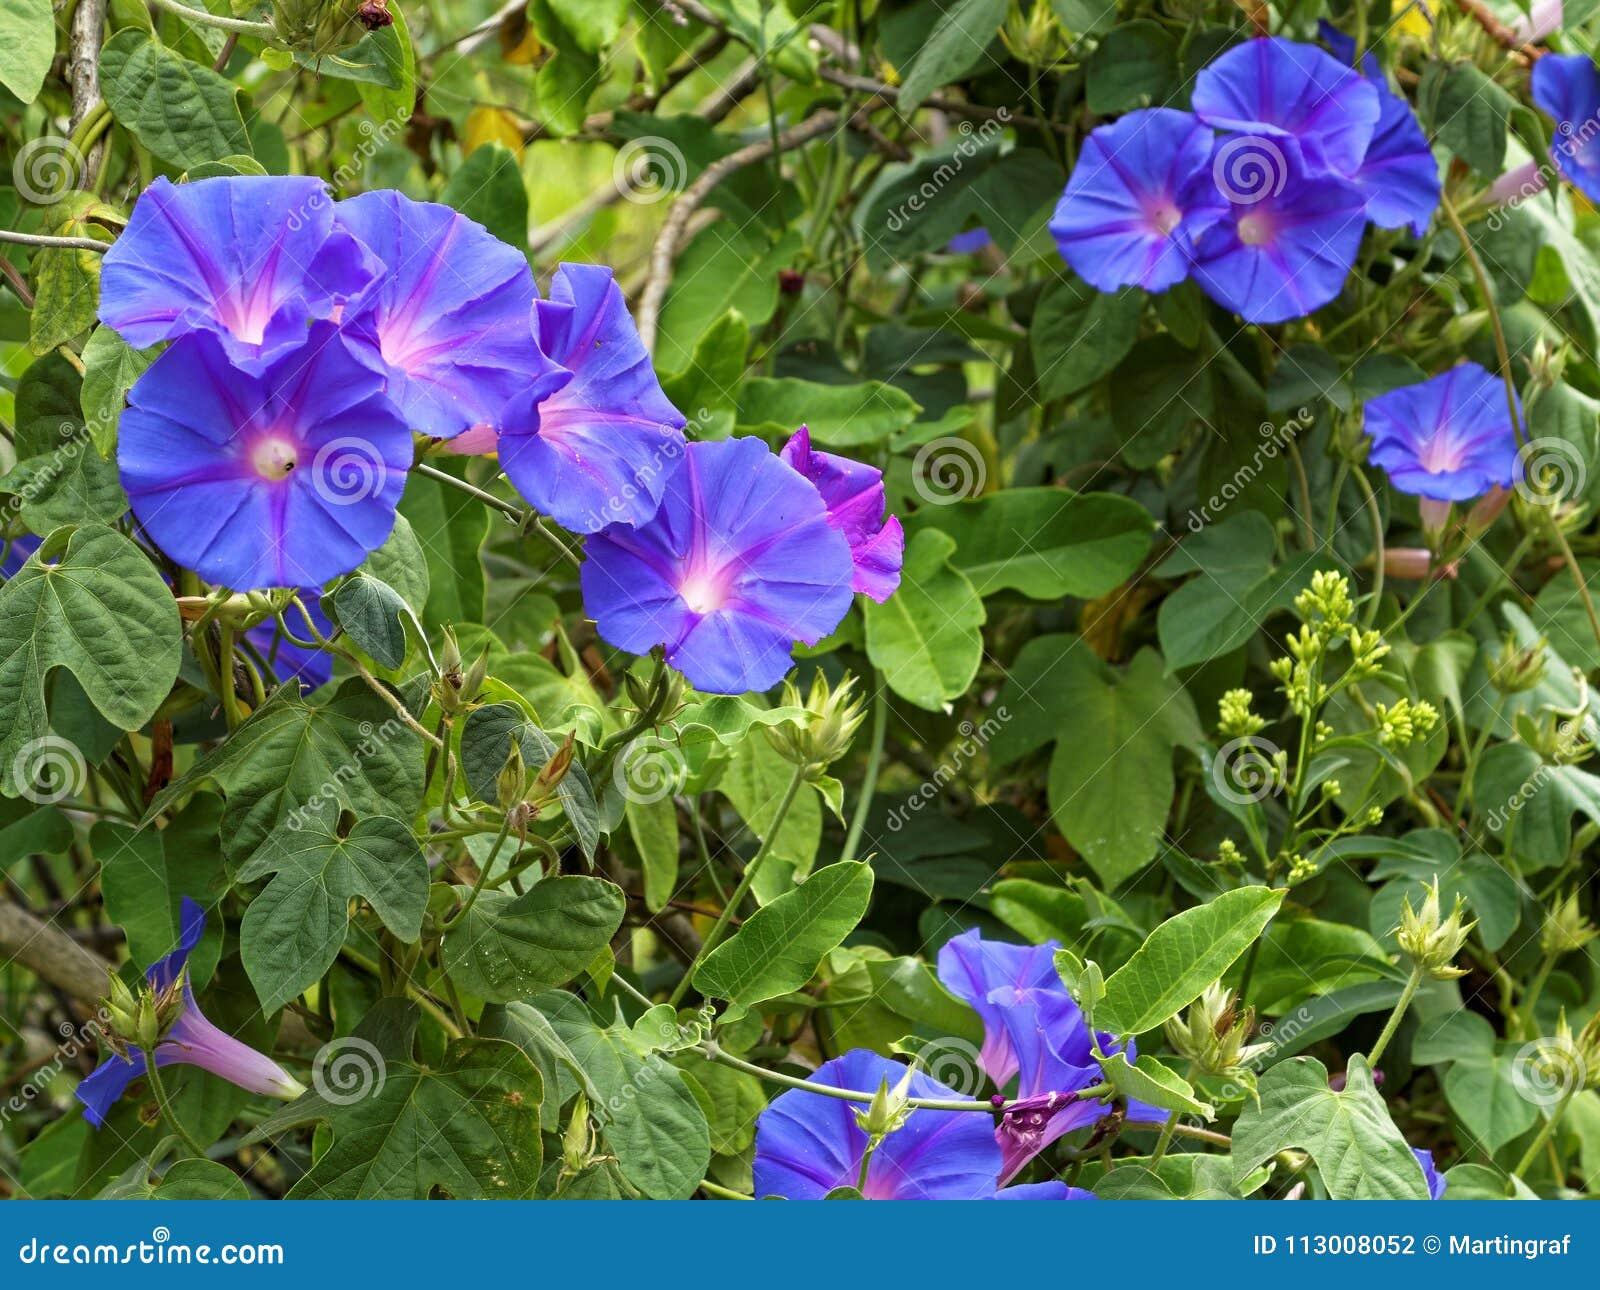 Morning glory flowering in green bush stock photo image of royalty free stock photo izmirmasajfo